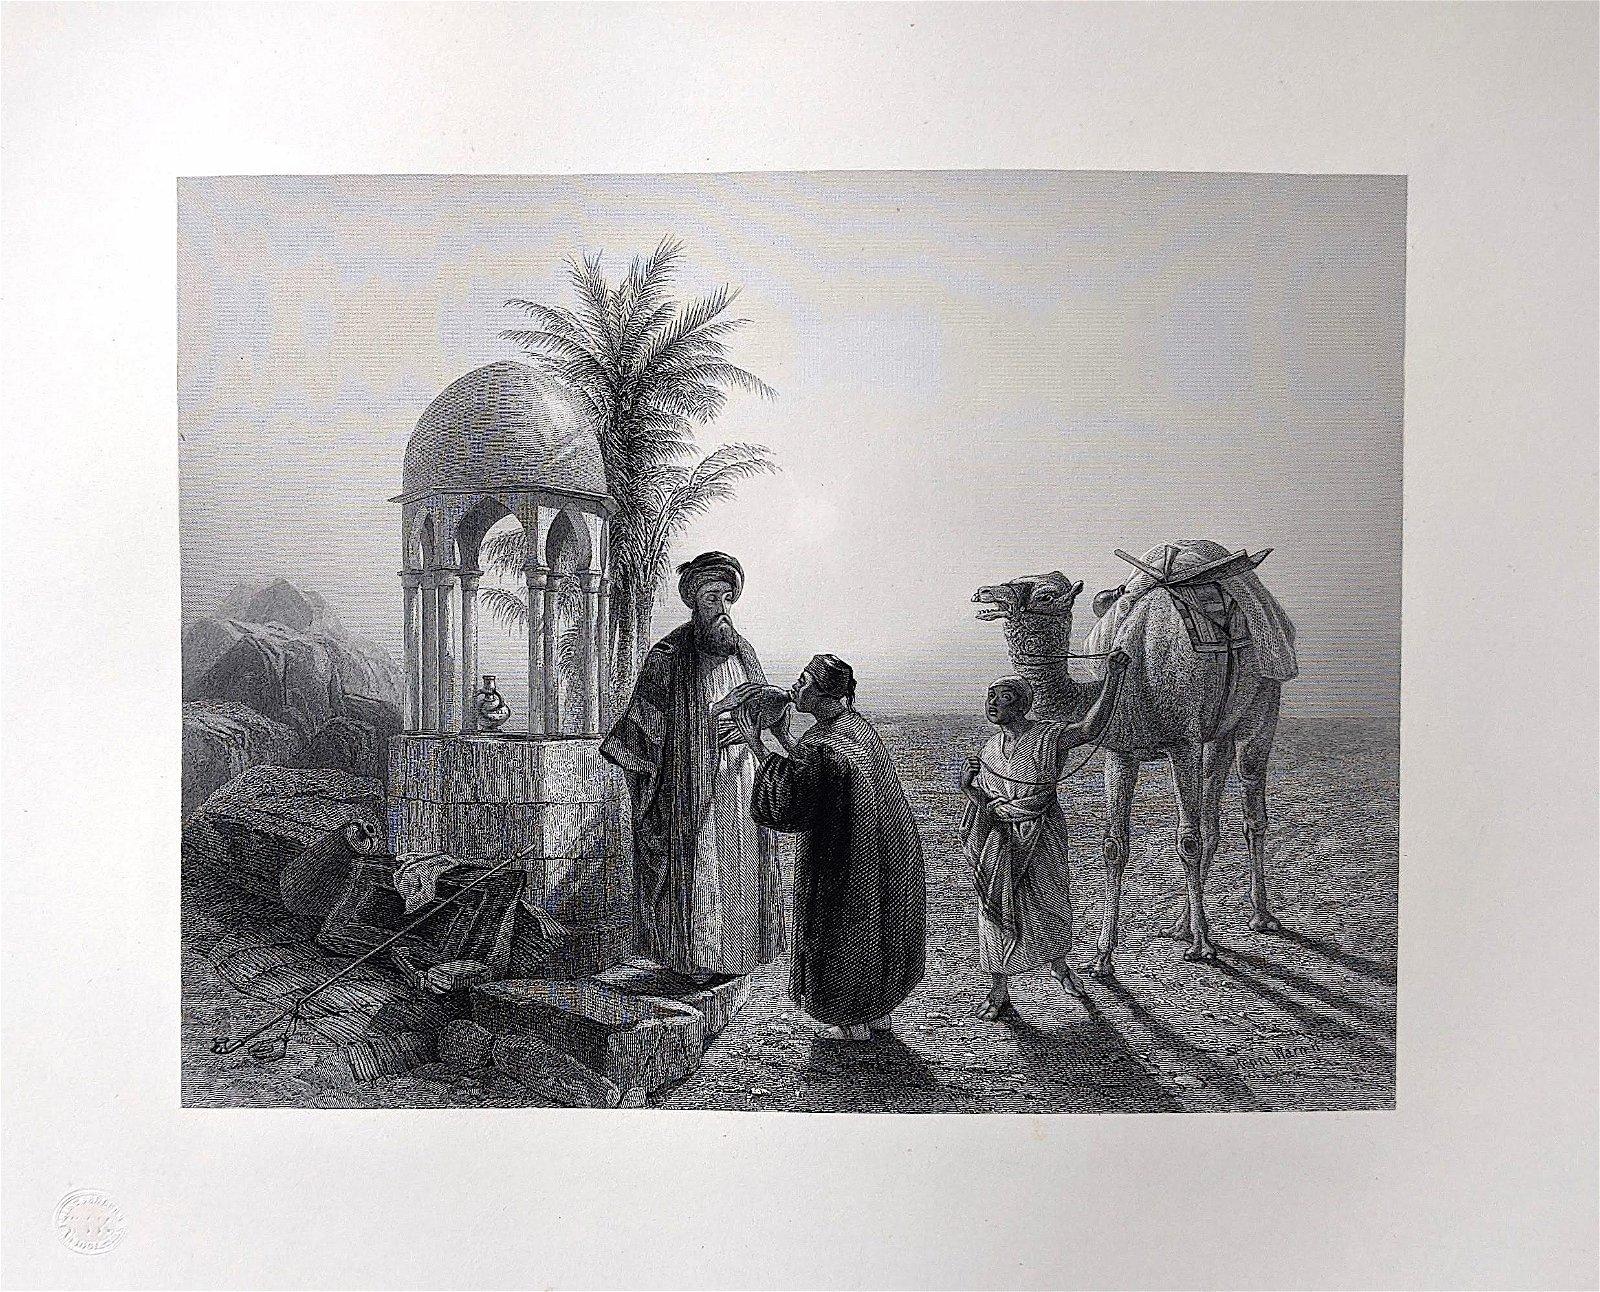 H. WARREN Museum Quality Antique Engraving, 1855